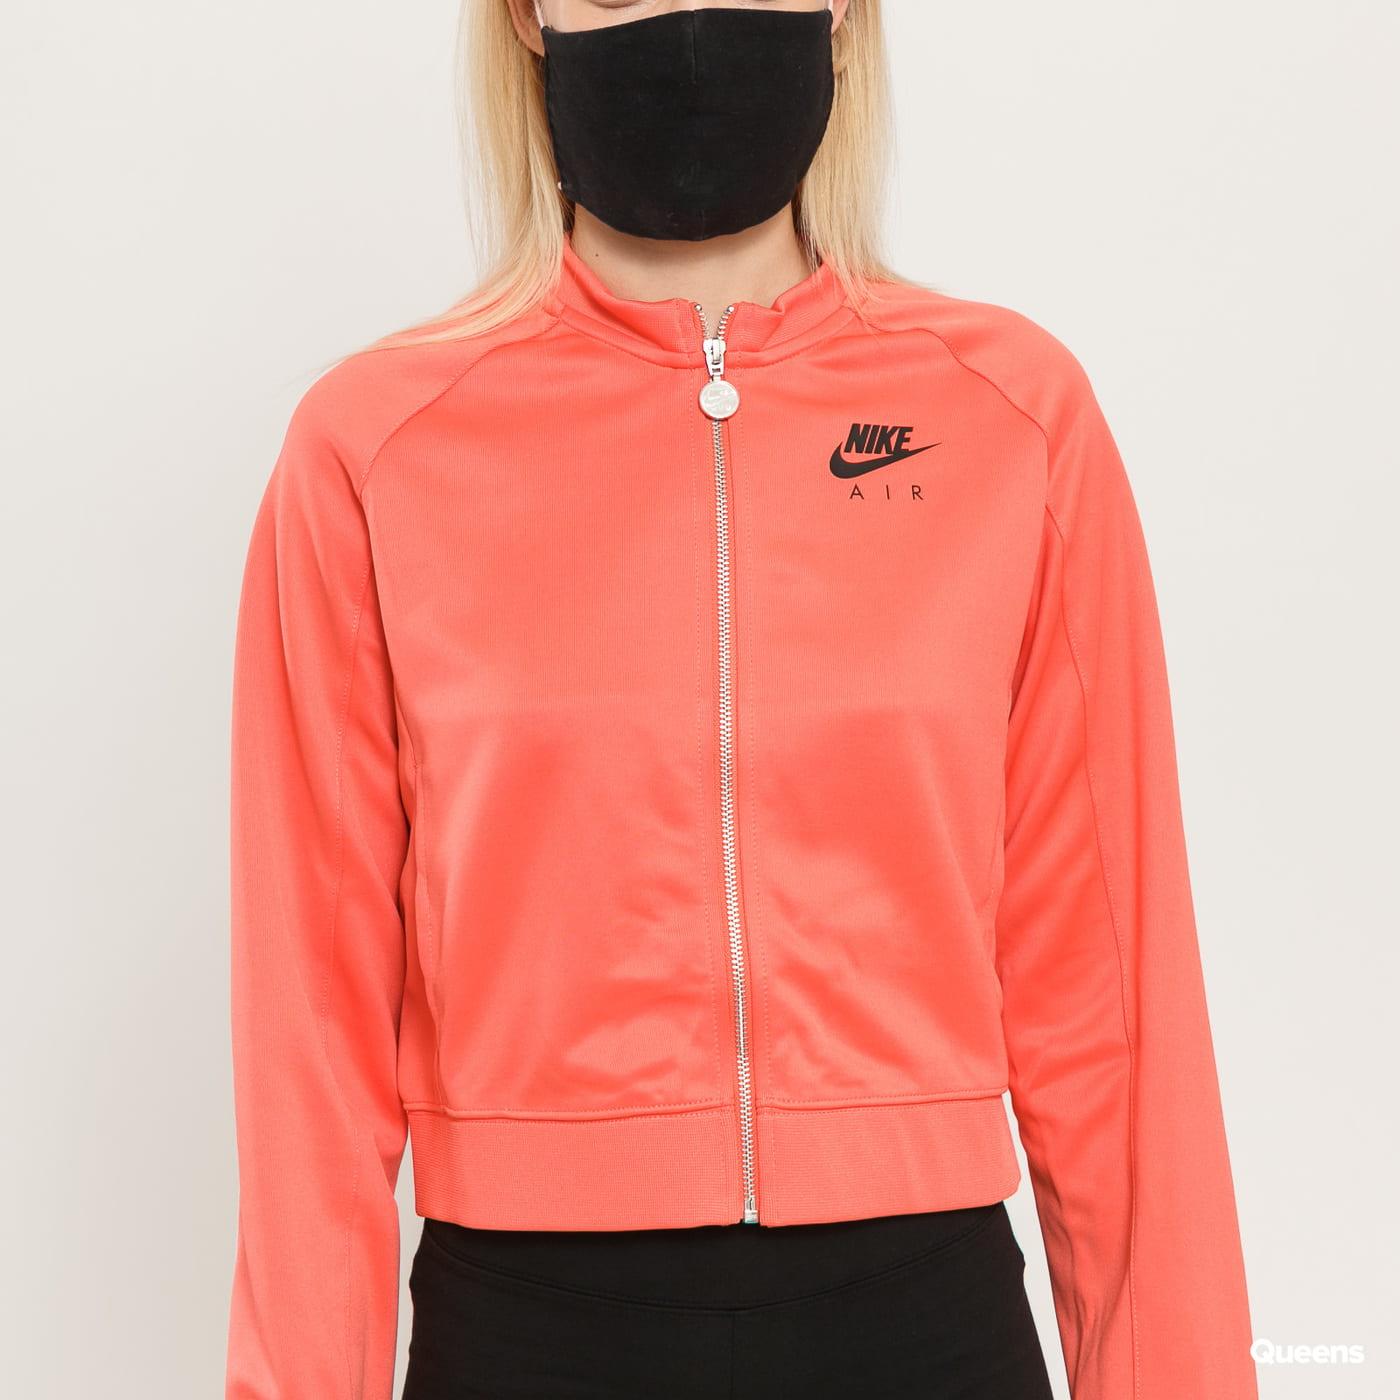 Nike W NSW Air Jakcet PK tmavě růžová